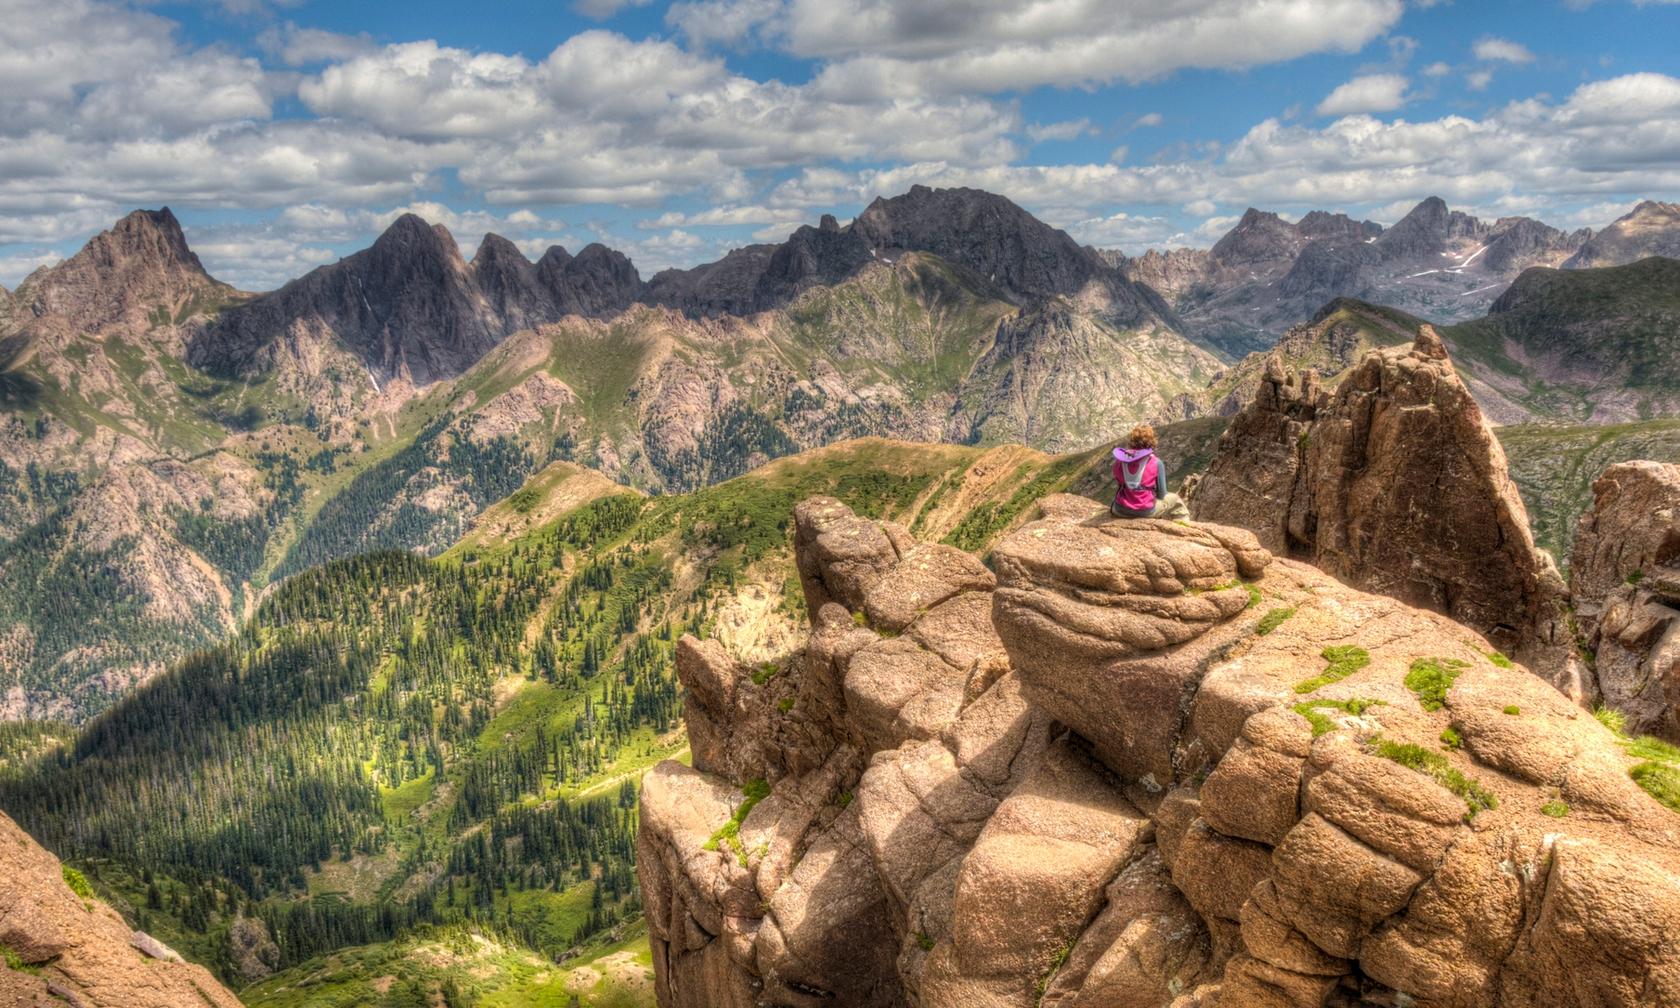 Vacation rentals in Durango